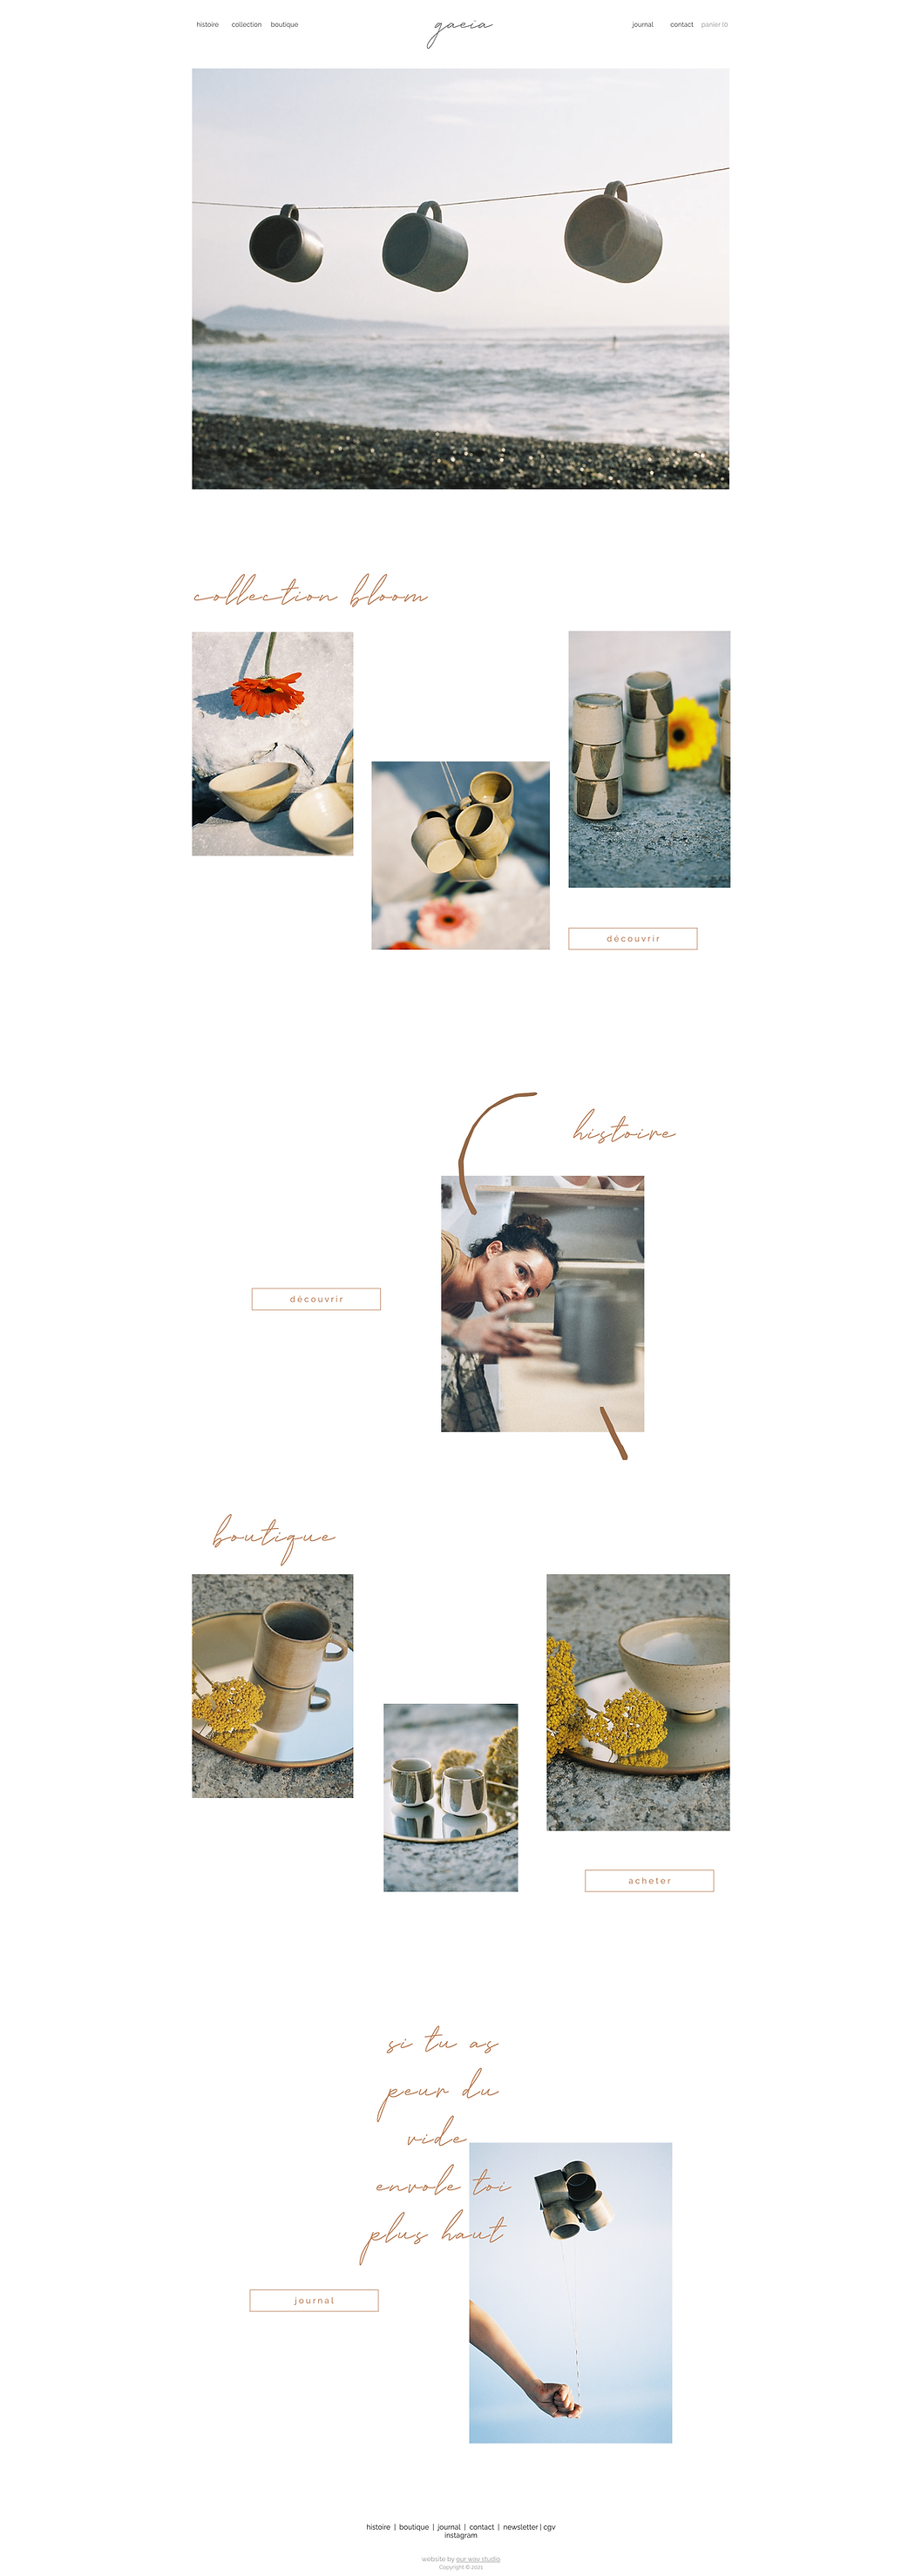 our-way-studio-artistic-direction-webdesign-graphism-brand-language-project-management-web